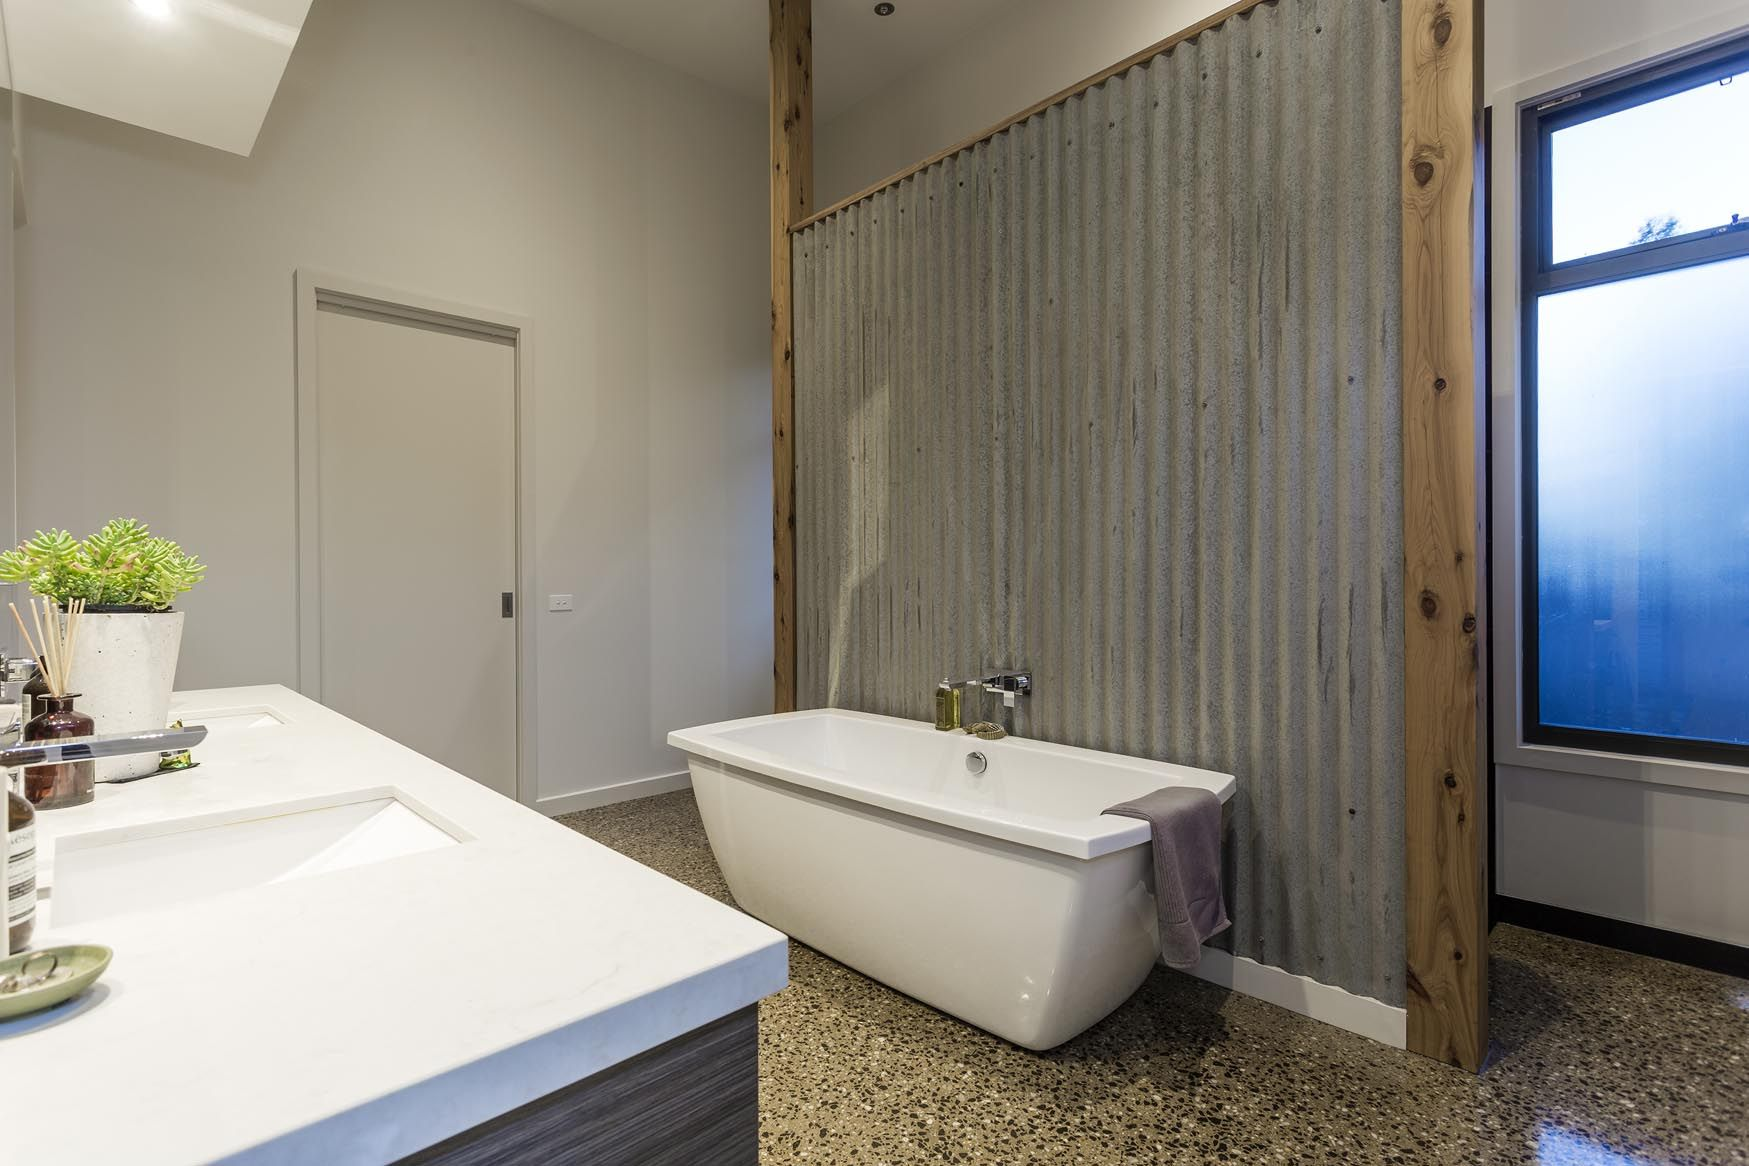 006 Open2view Id293424 5 Gregory Drive_ Inverleigh Bathroom  # Muebles Dencina Granada